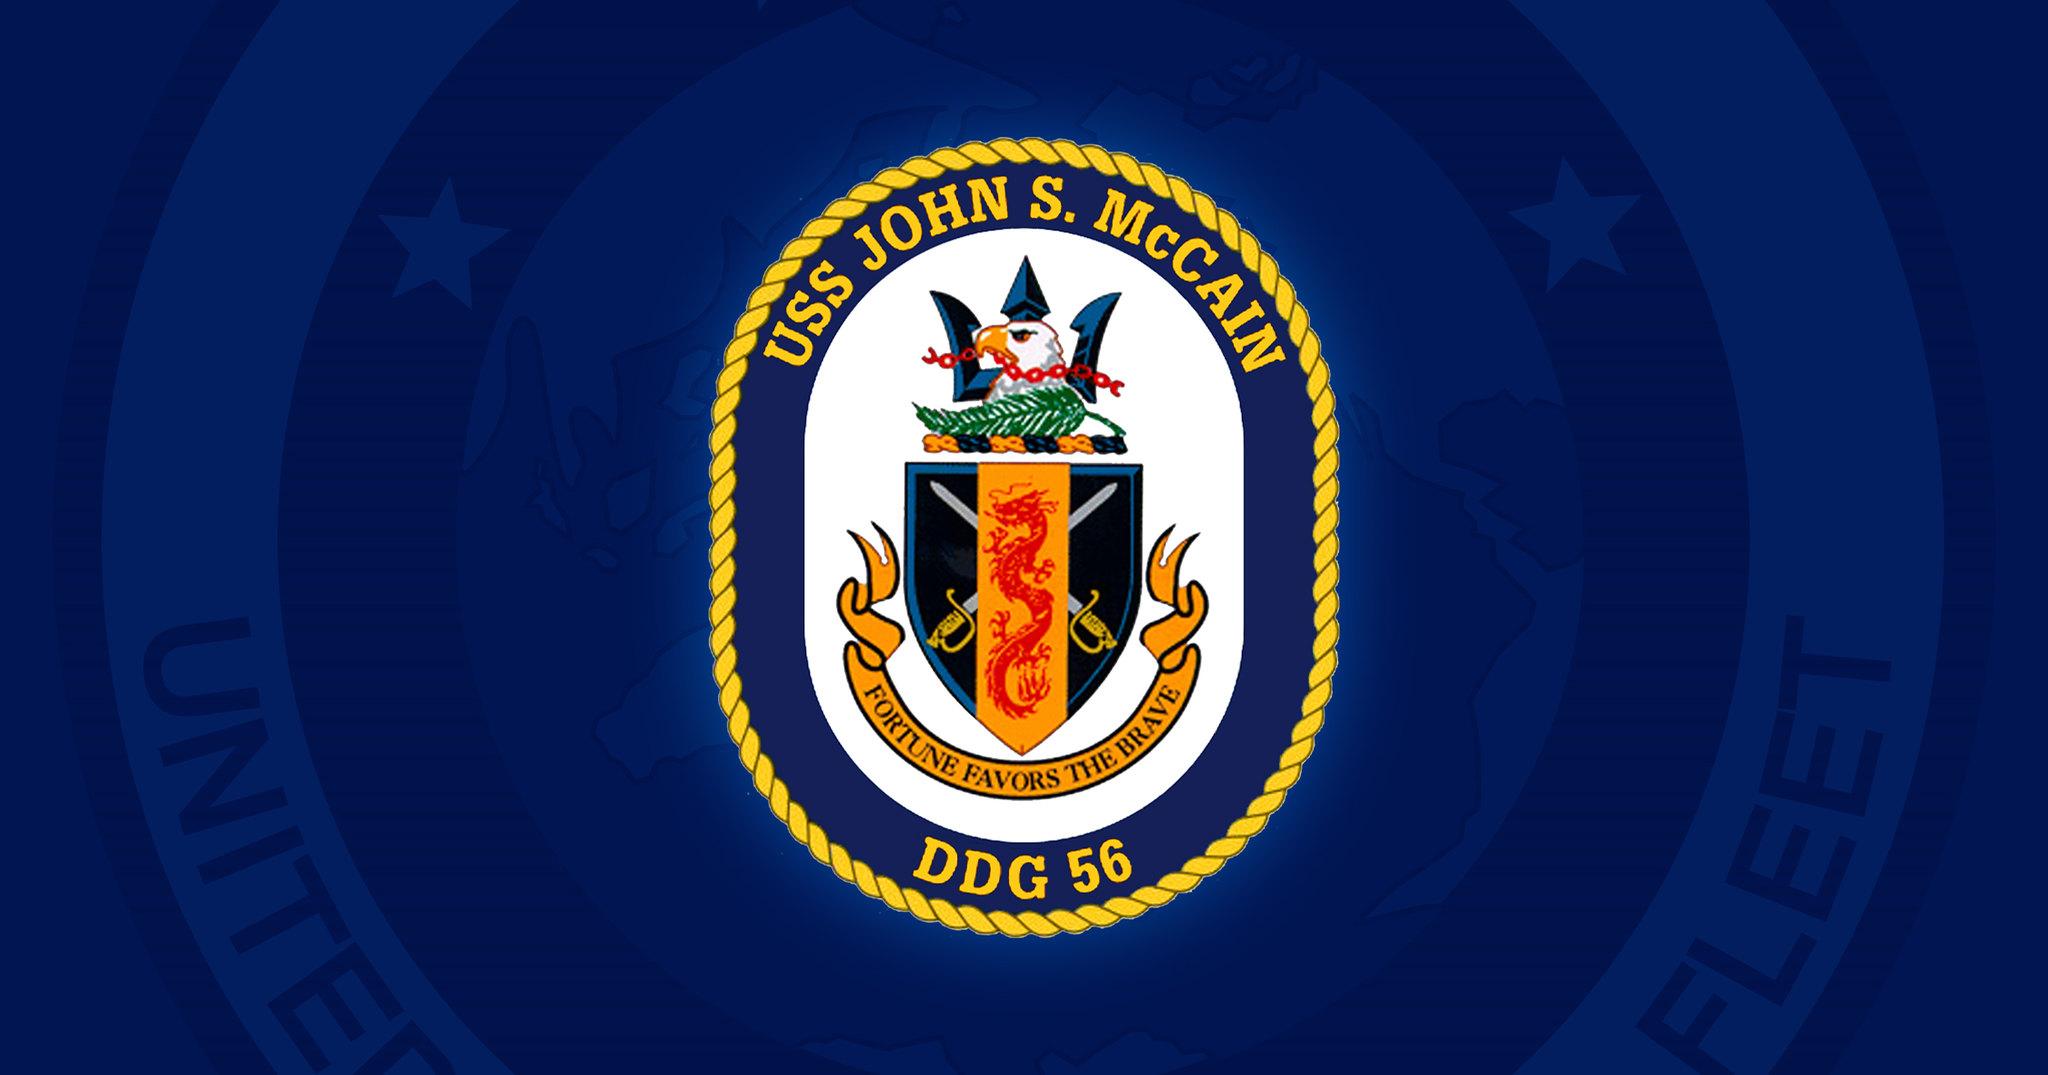 USS John S  McCain commanding officer, executive officer